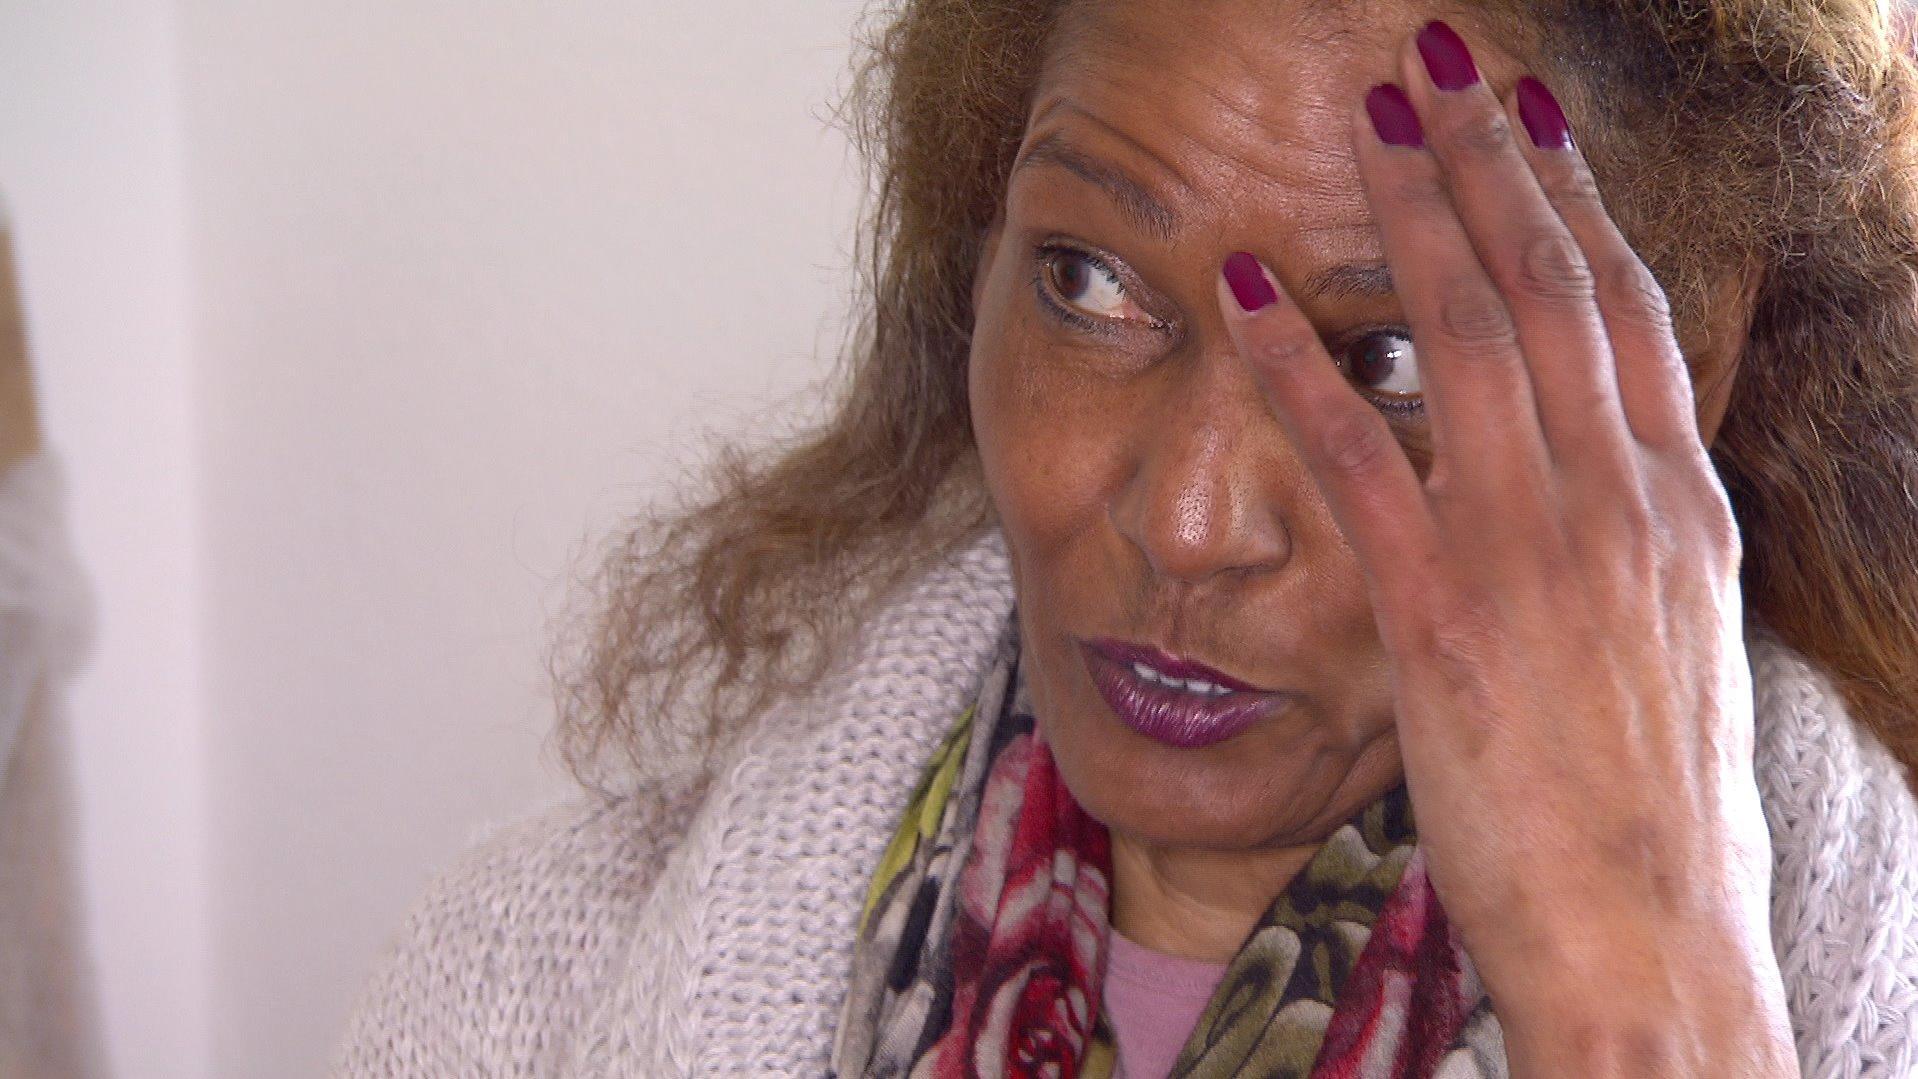 Nadja Abd El Farrag Scheitert Der Ersehnte Neustart Am Coronavirus